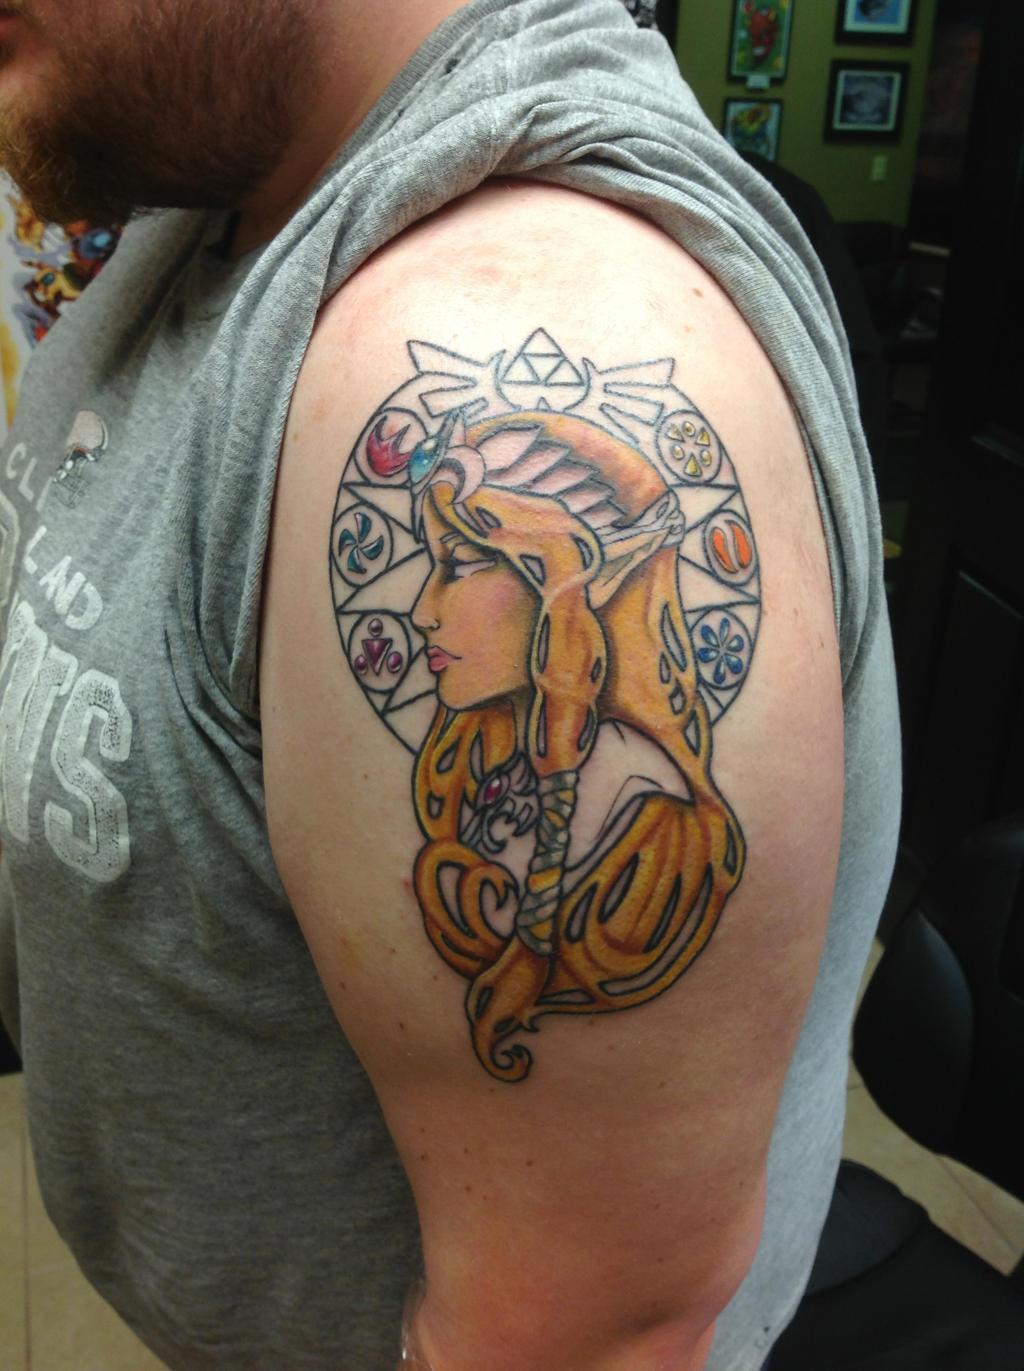 Art Nouveau Tattoo Design By Tegan Ray: Princess Zelda Art Nouveau Style Tattoo By